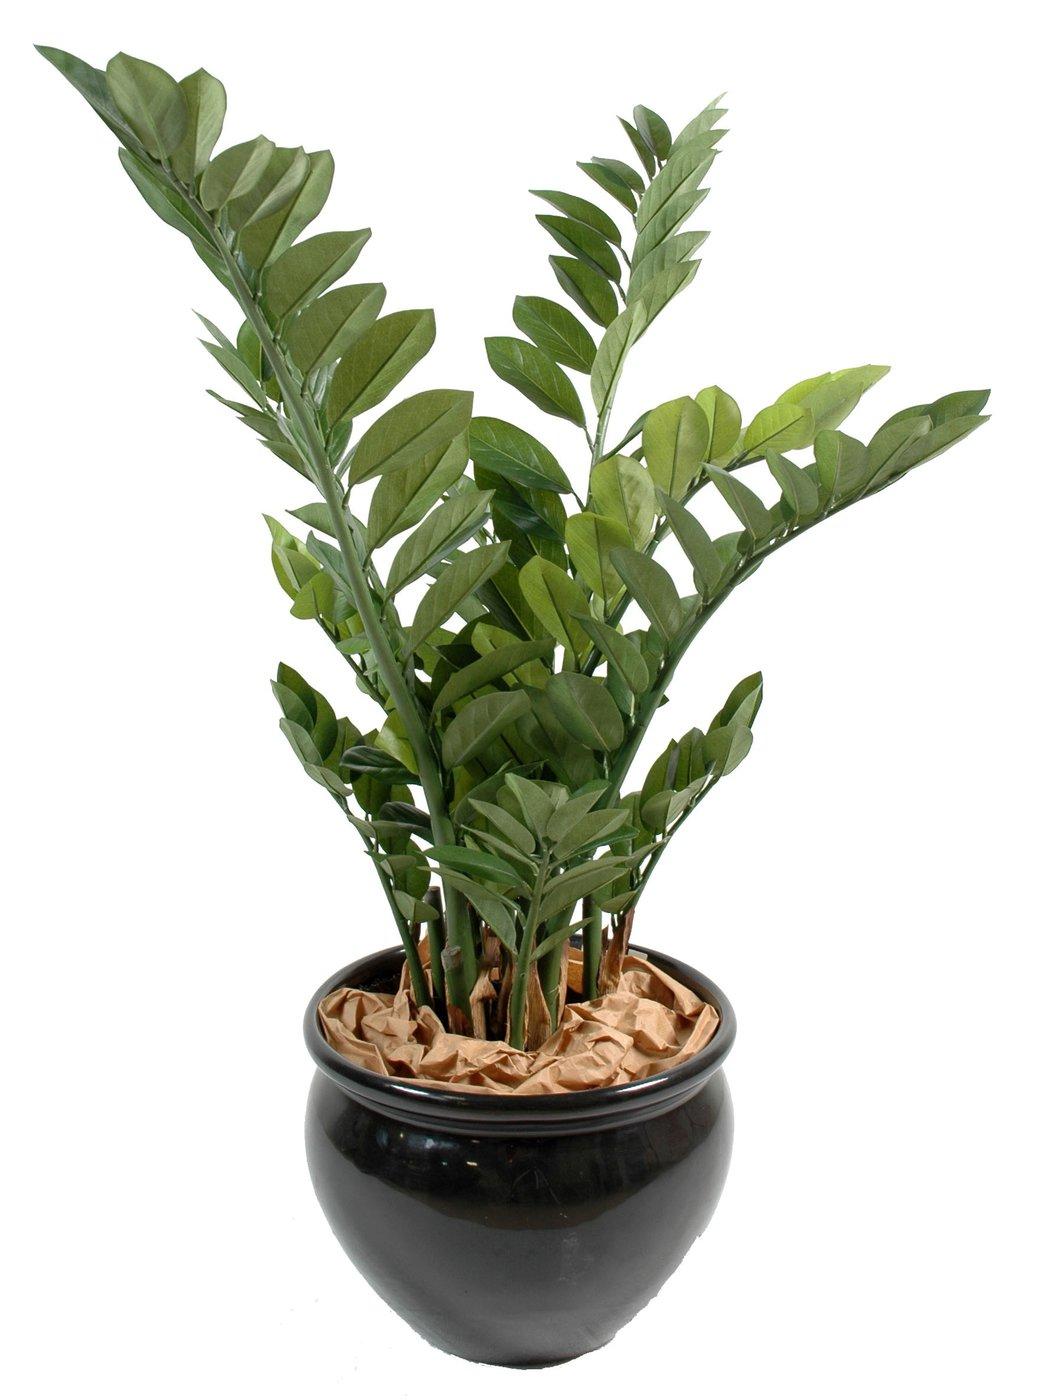 Planta zamia tropicais ingarden for Planta ornamental zamia